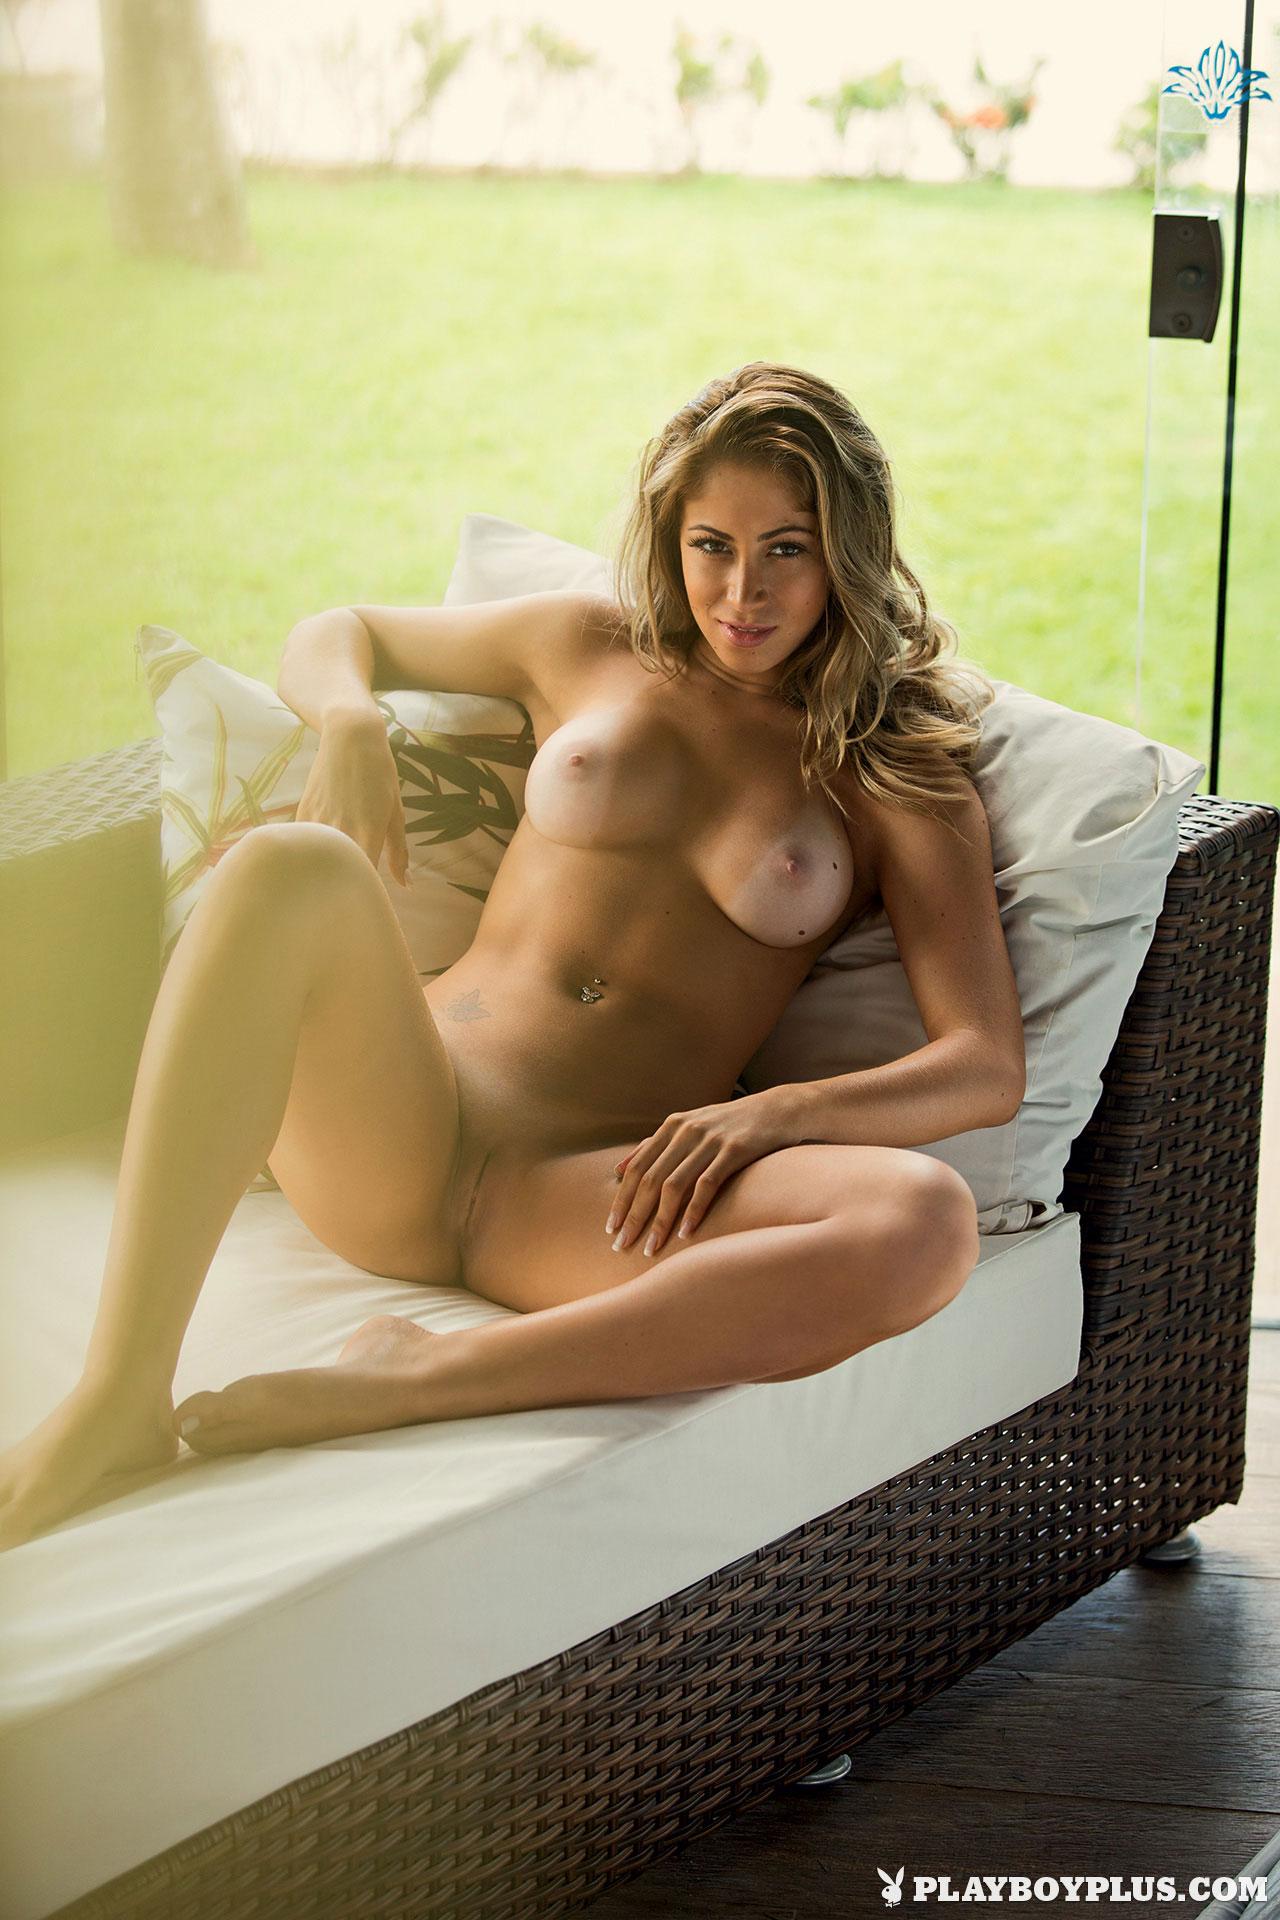 brittany stryker nude gallery